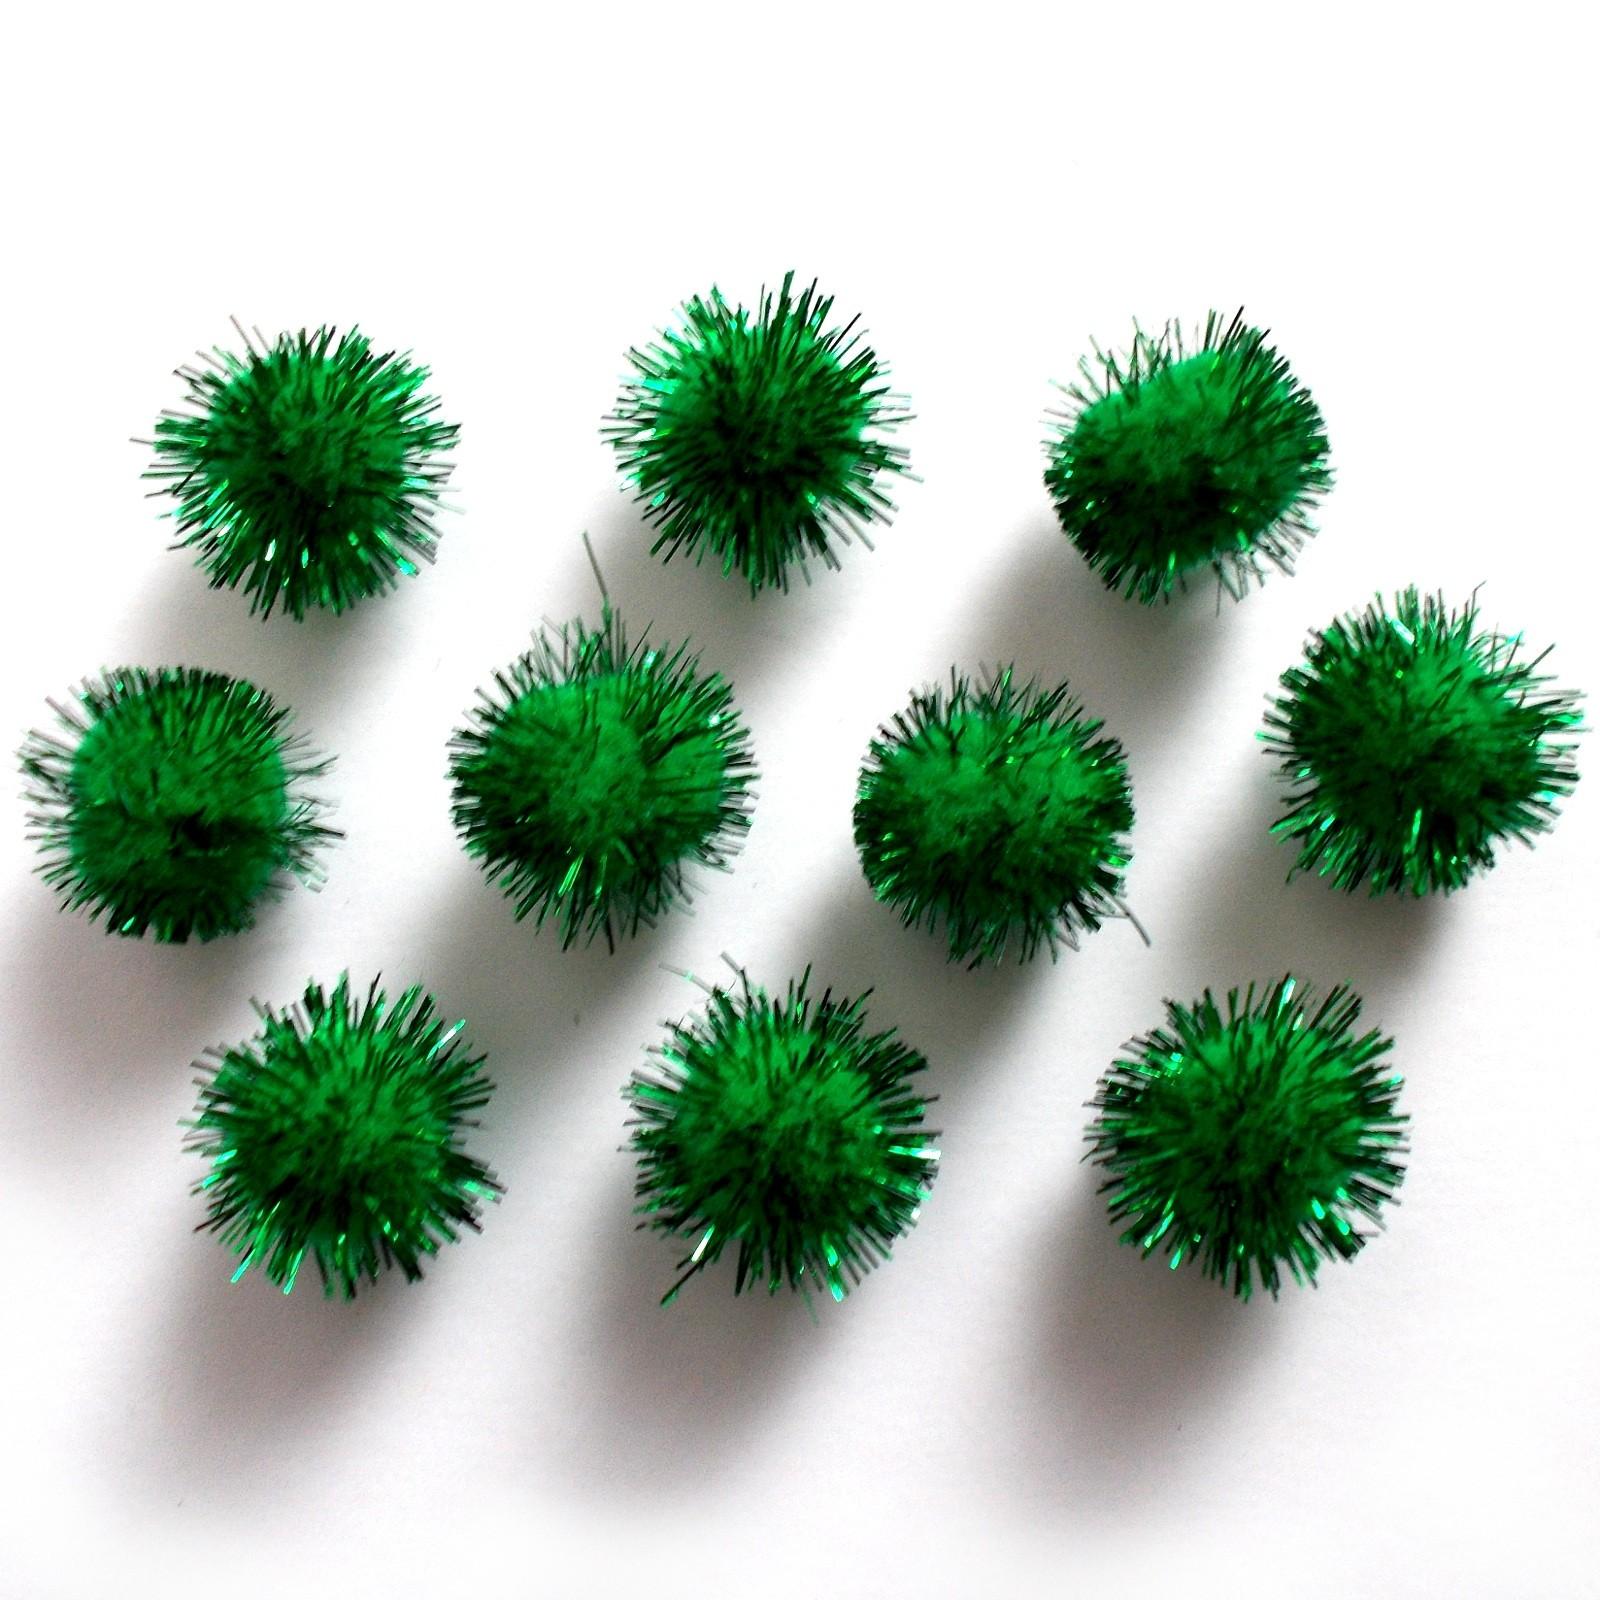 Metallic Pom Poms 25mm Green Pack of 10